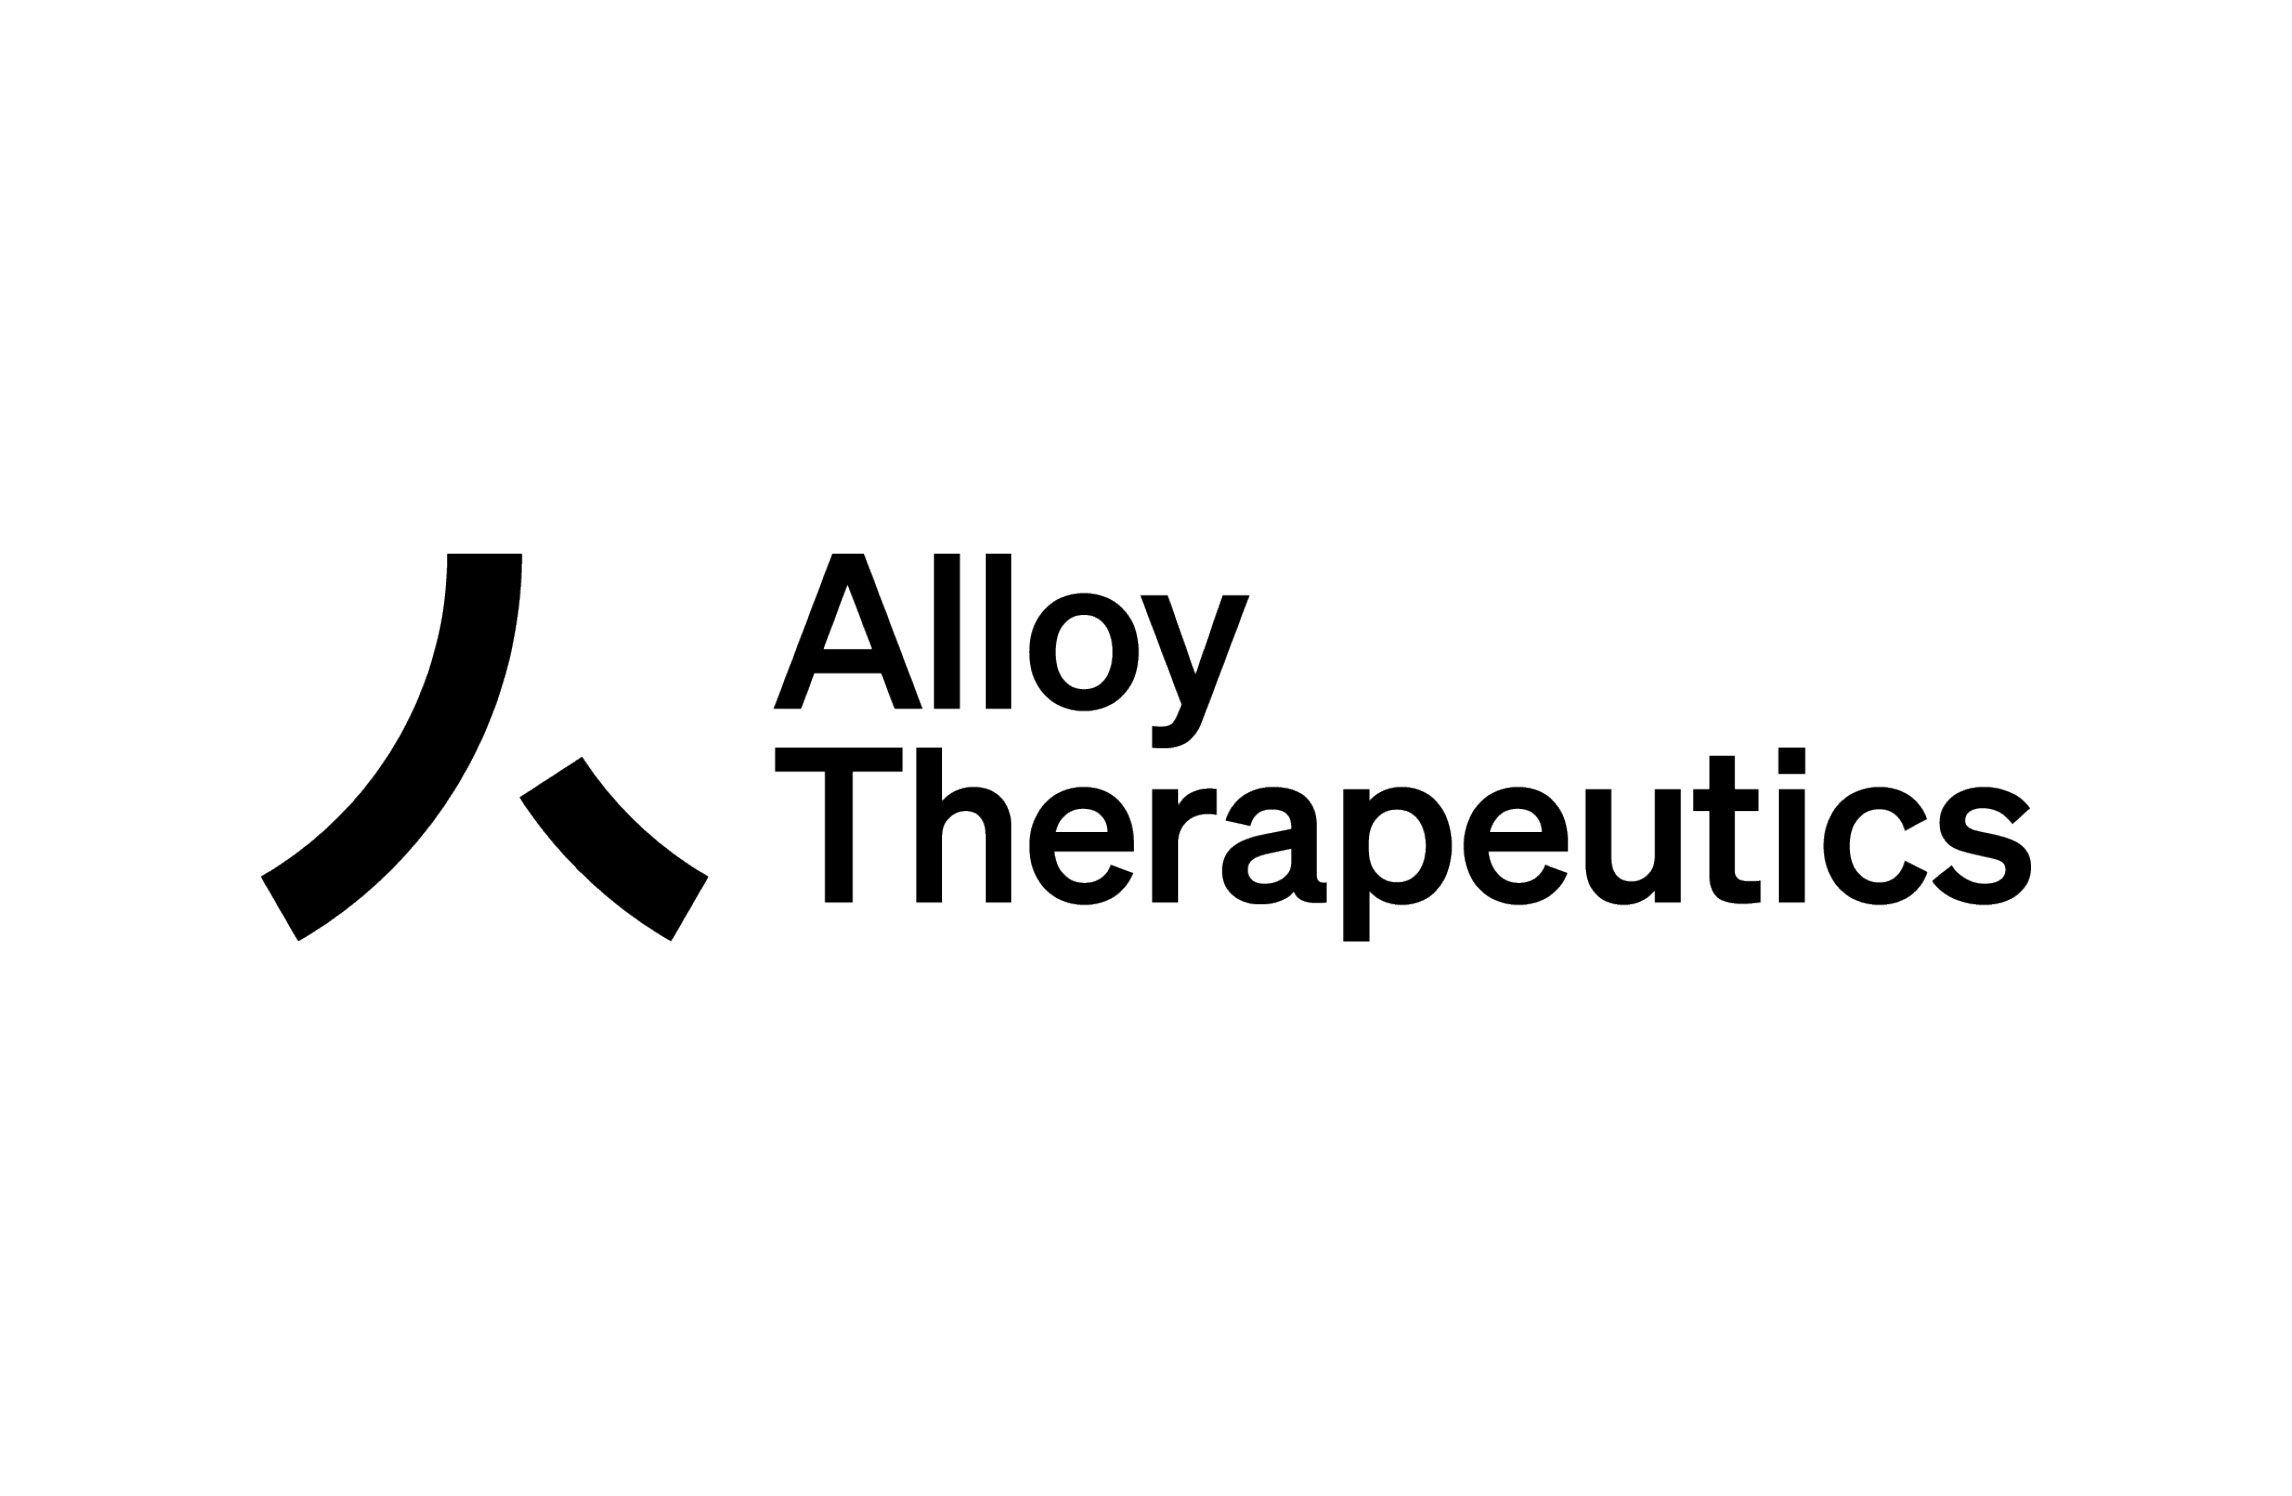 Alloy Therapeutics